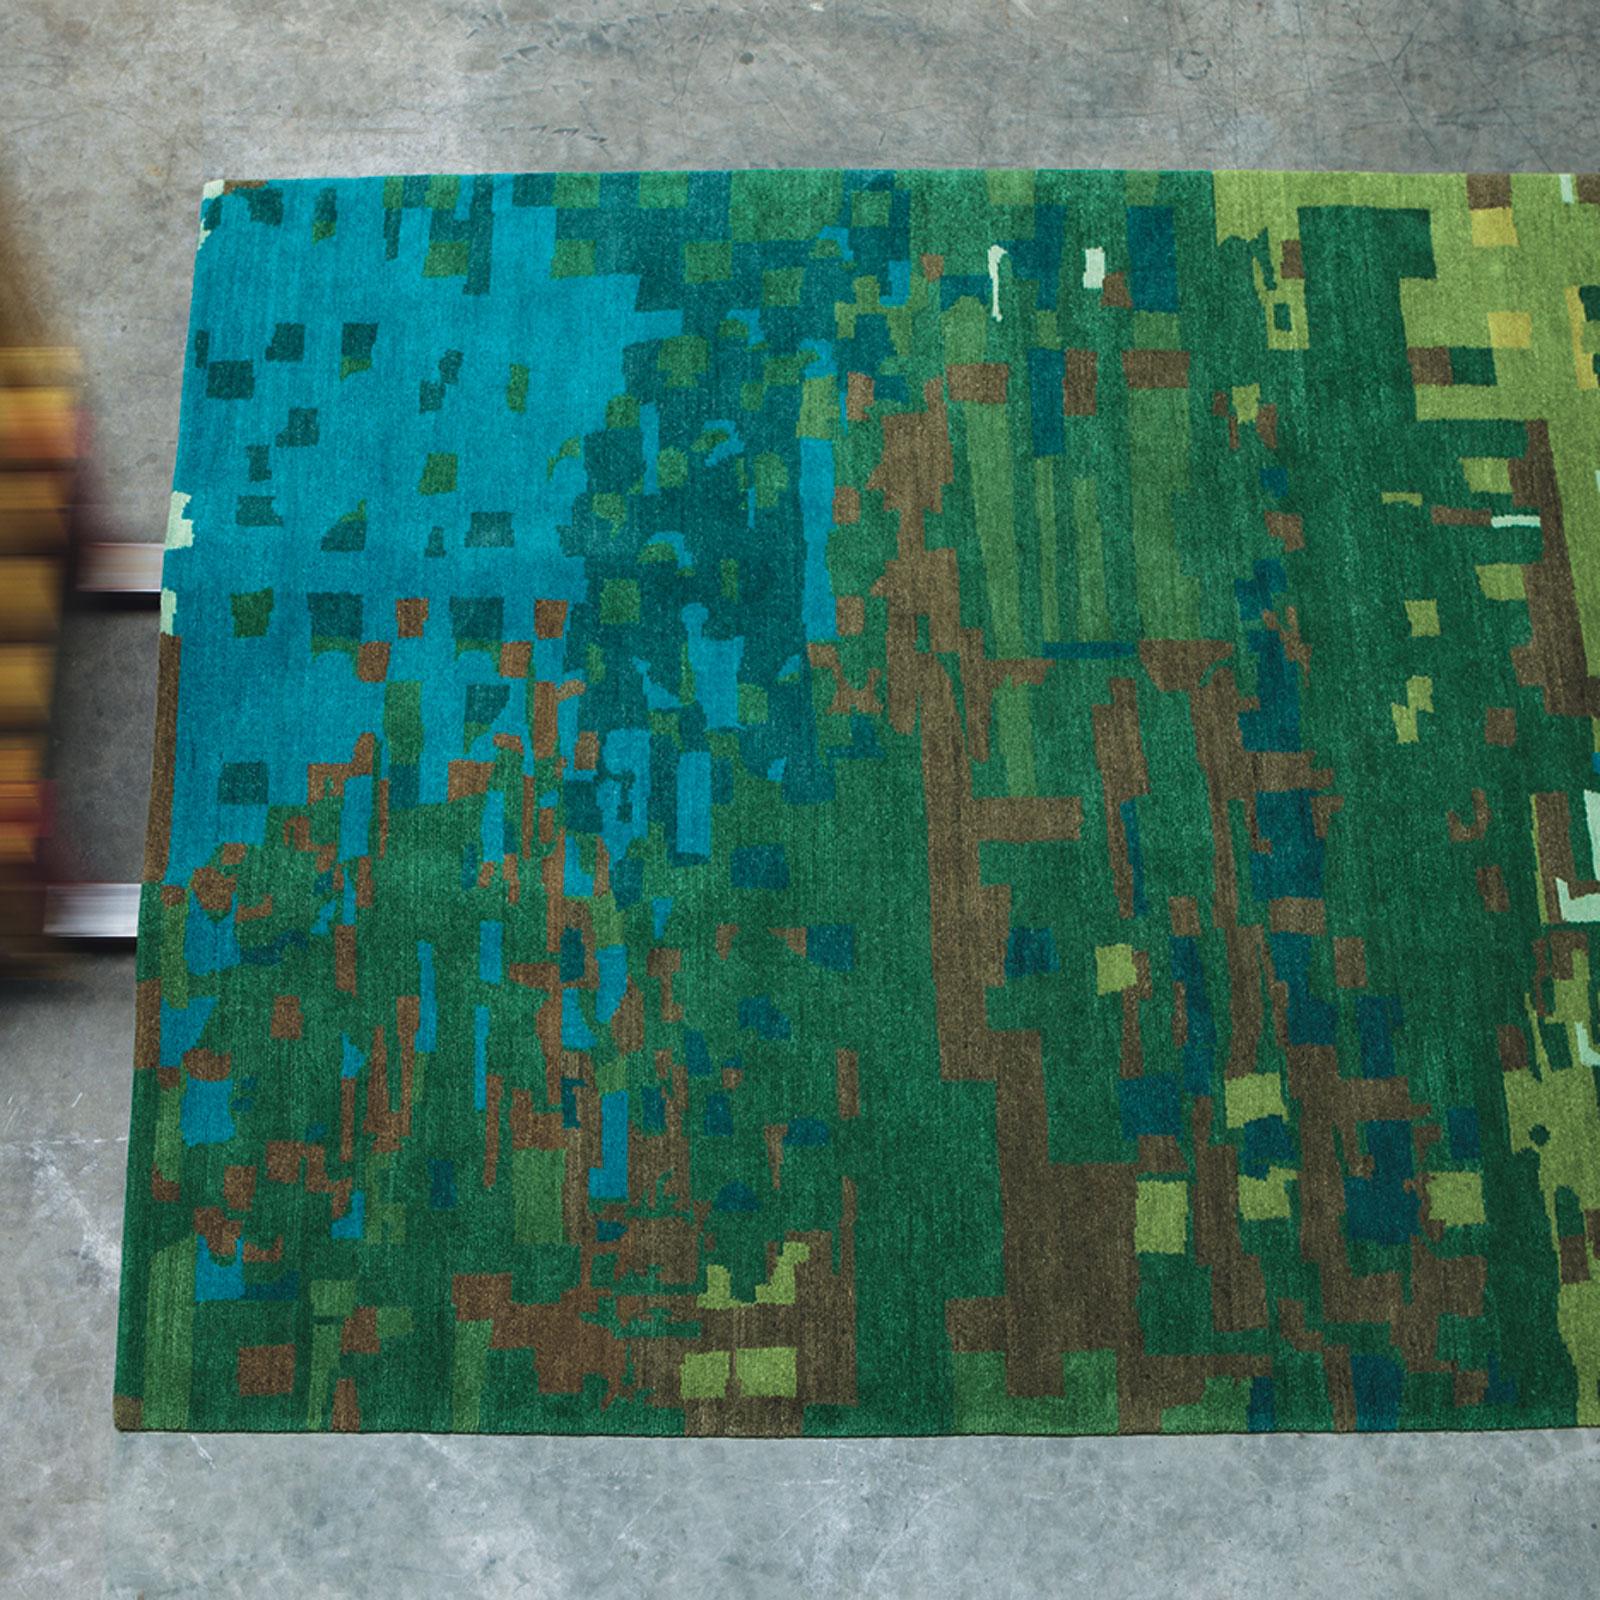 Kodari Mist Rugs 34207 Green Blue Hand Knotted Wool Rugs